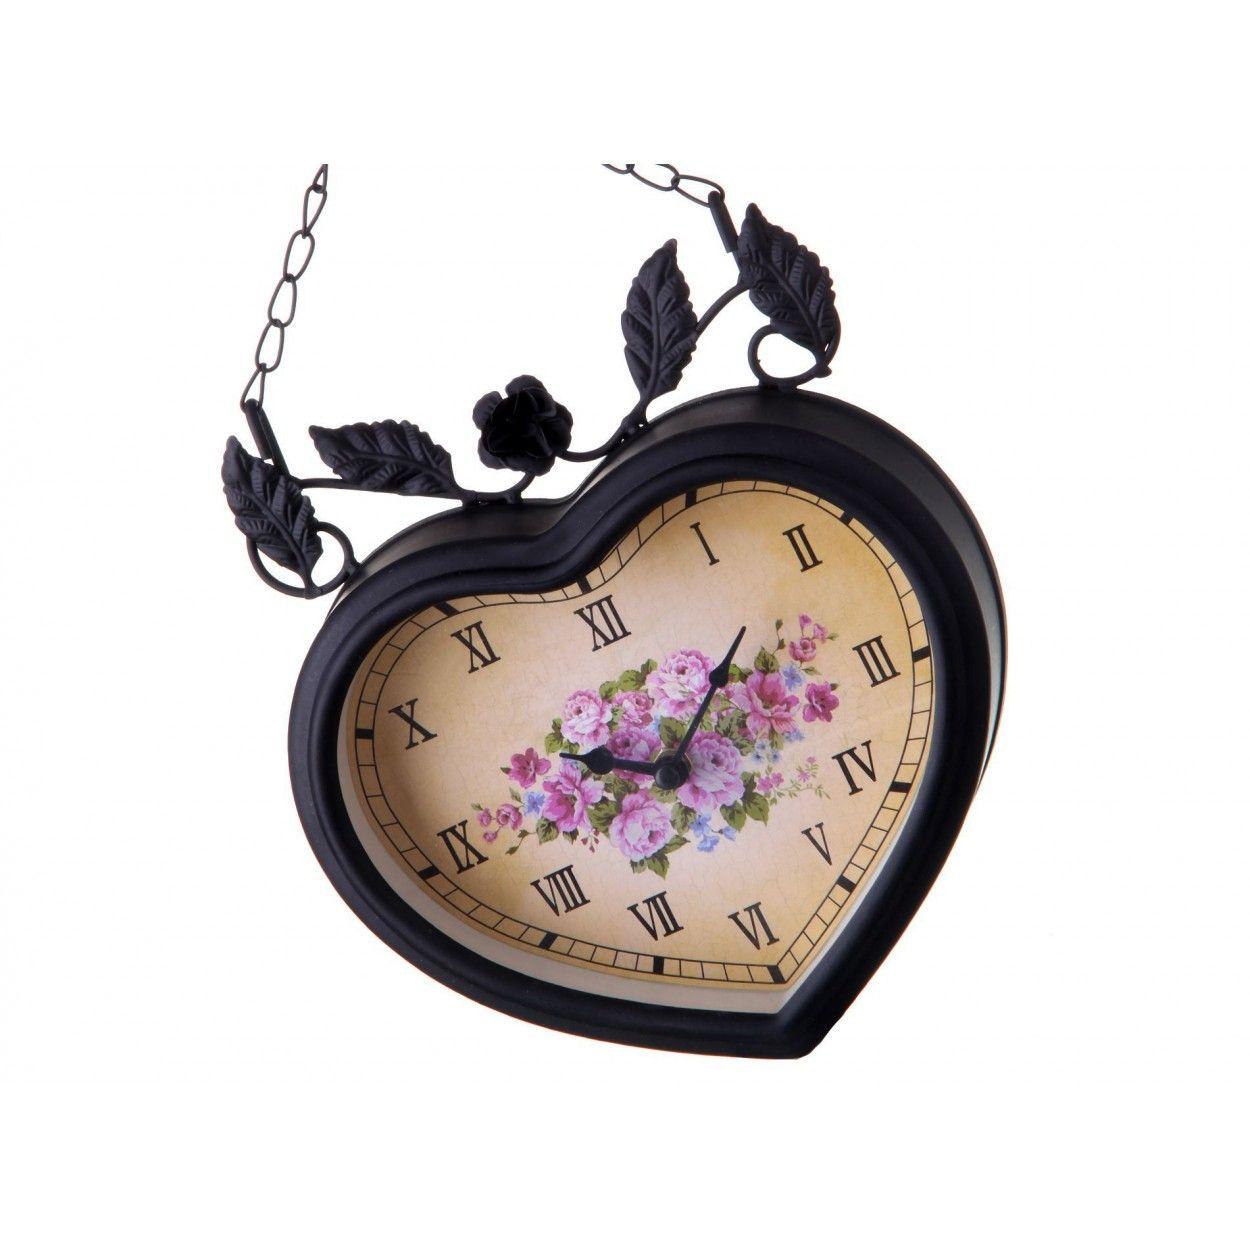 Reloj pared dise o tradicional metal negro con flores y - Reloj pared diseno ...